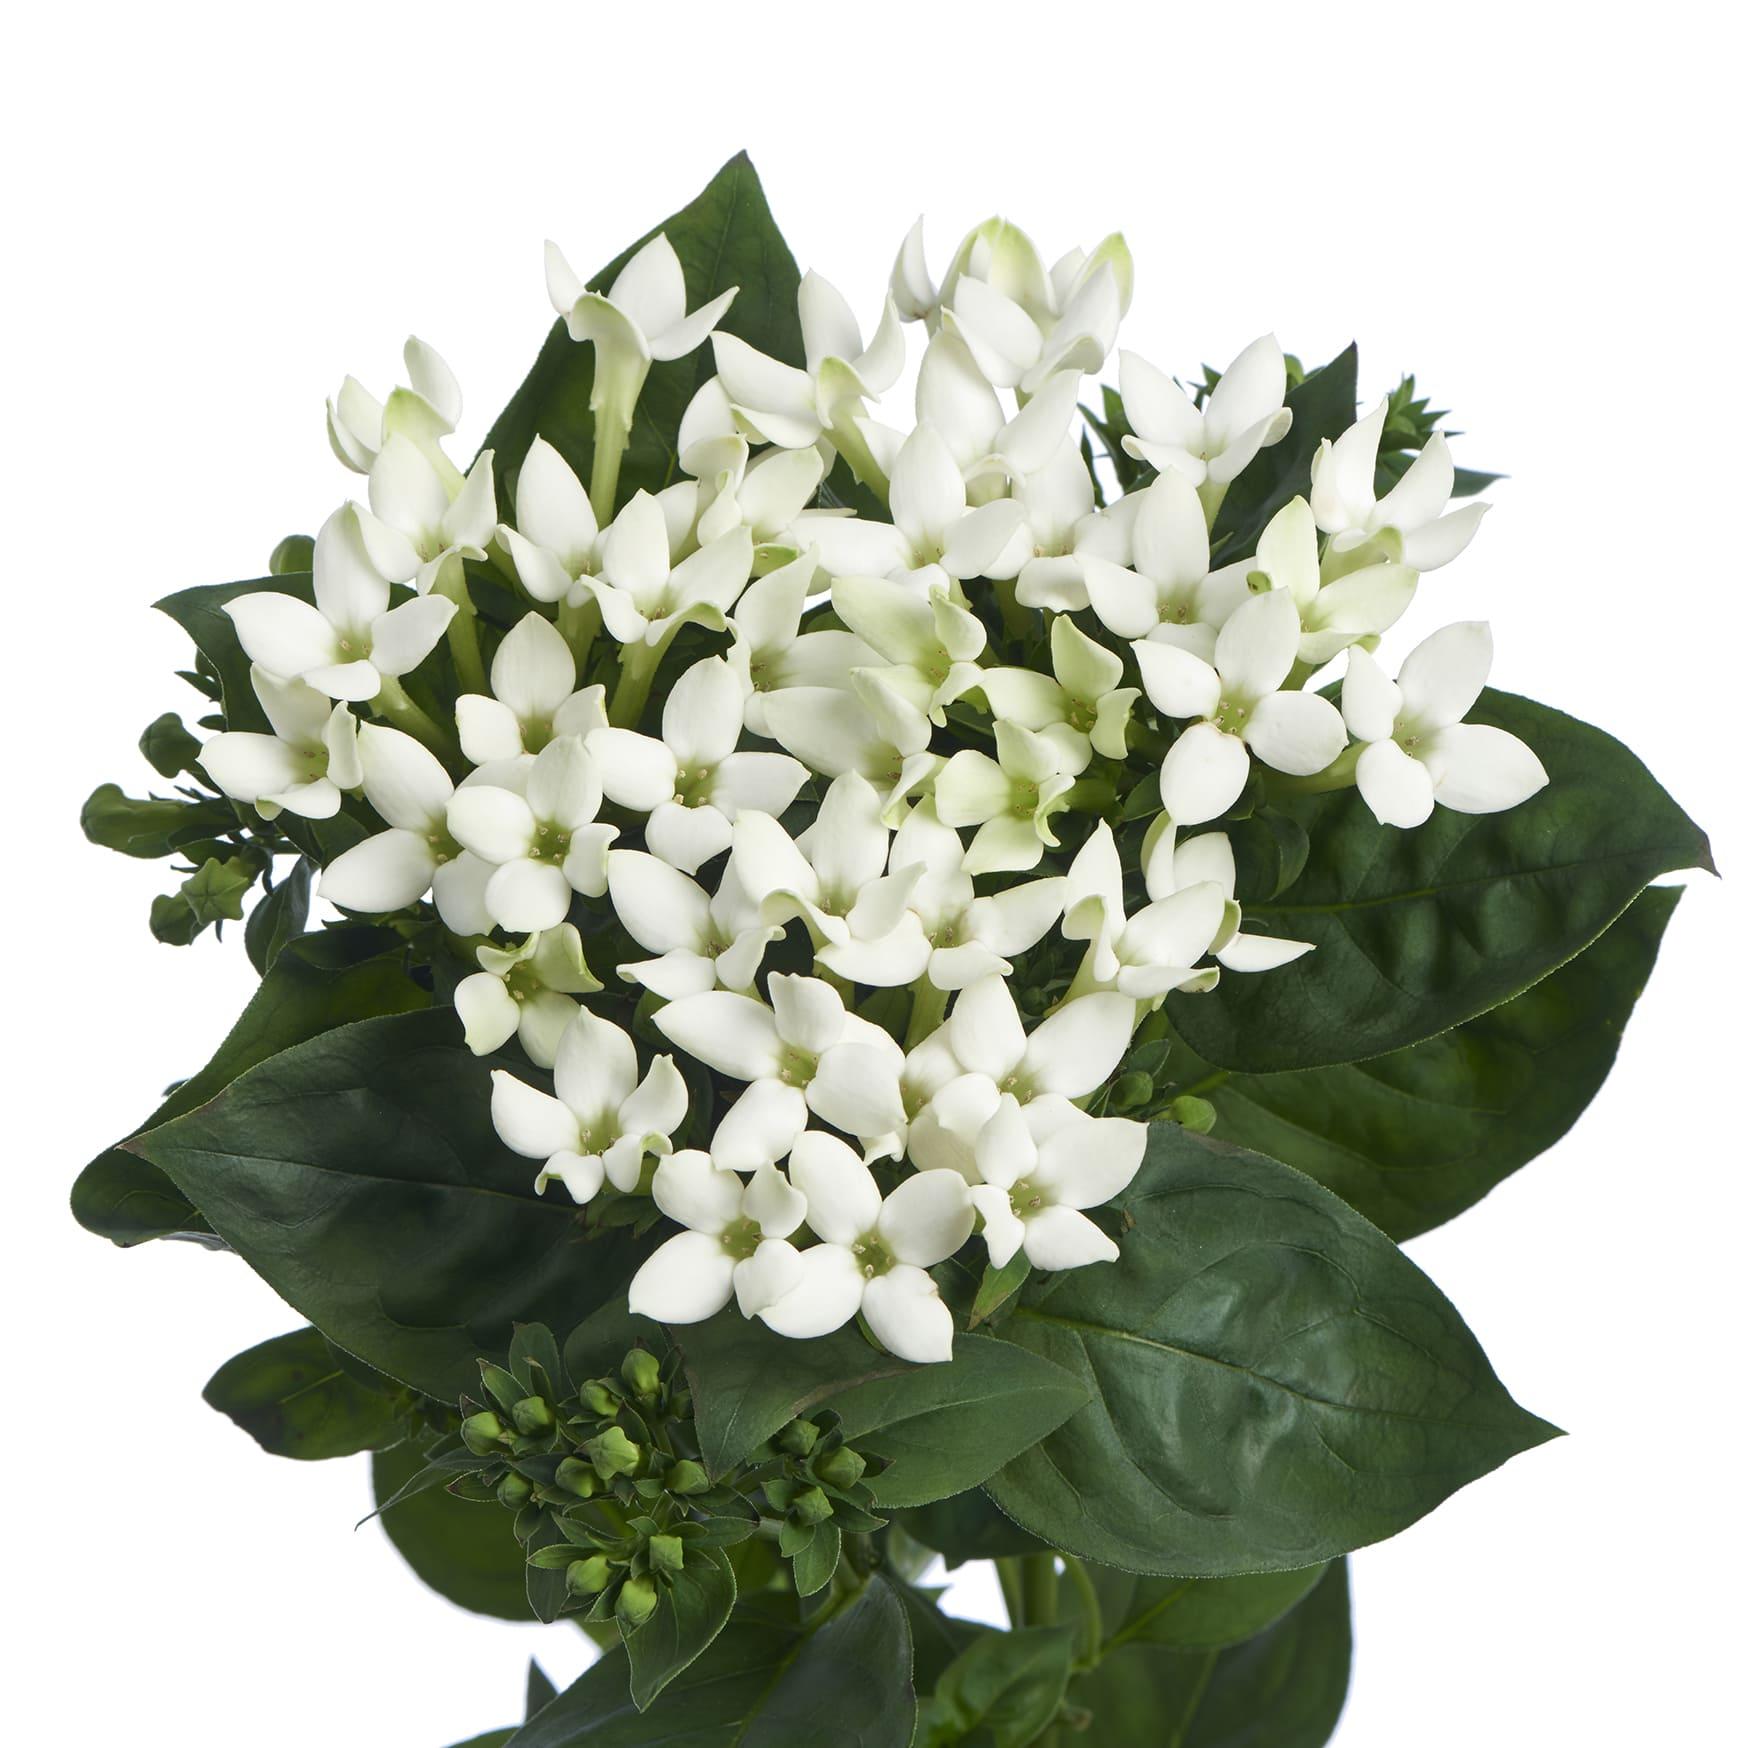 RVZ_bouvardia_Royal_White_Verde -Borgijink